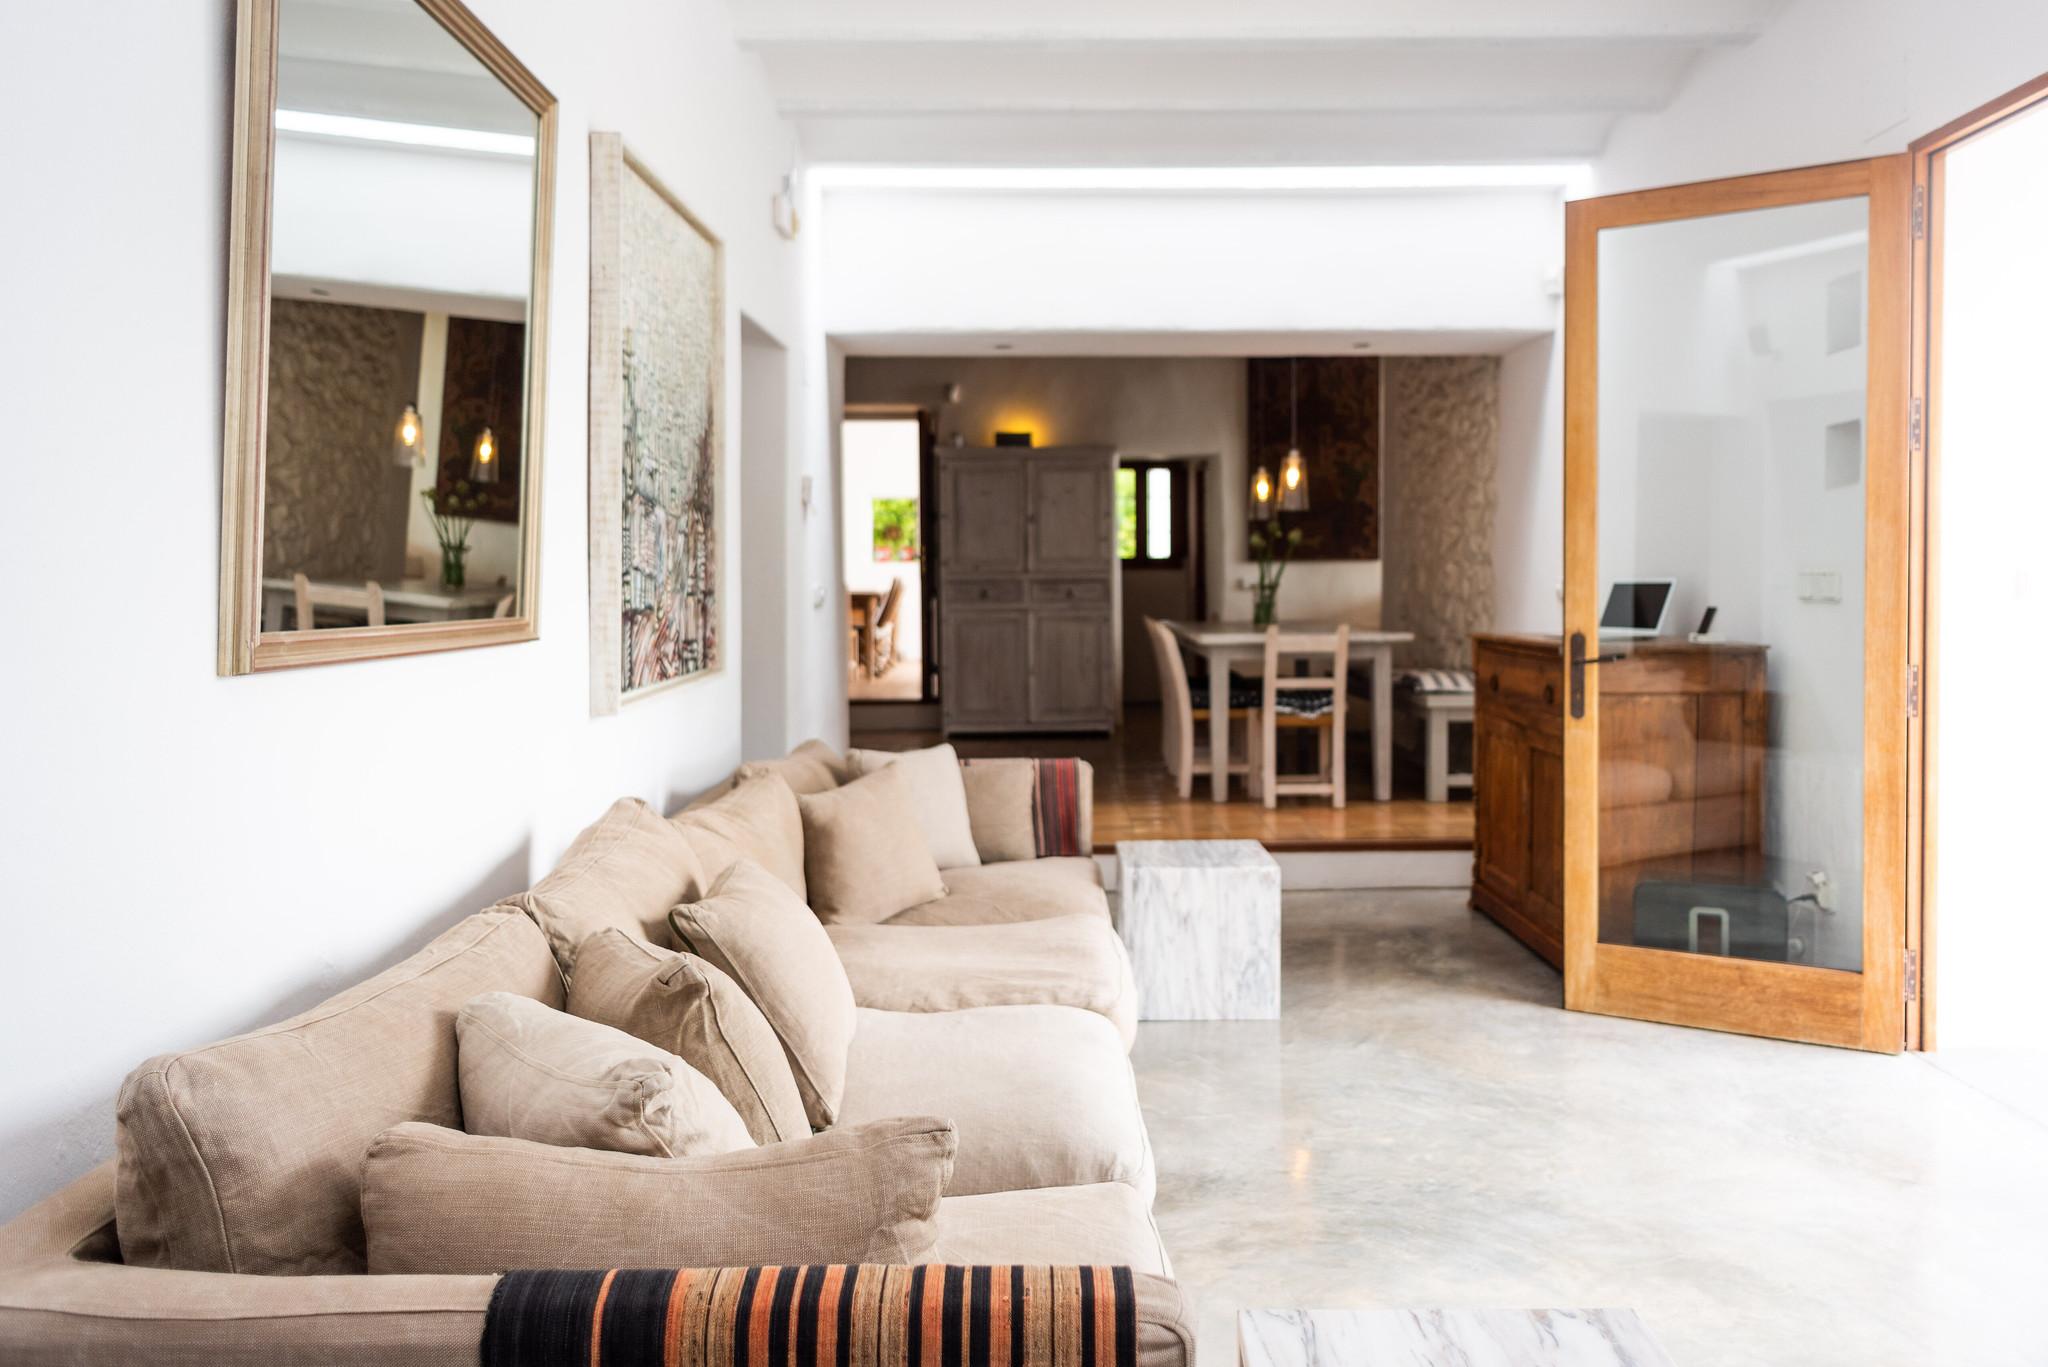 https://www.white-ibiza.com/wp-content/uploads/2020/05/white-ibiza-villas-can-lyra-interior-living-room.jpg